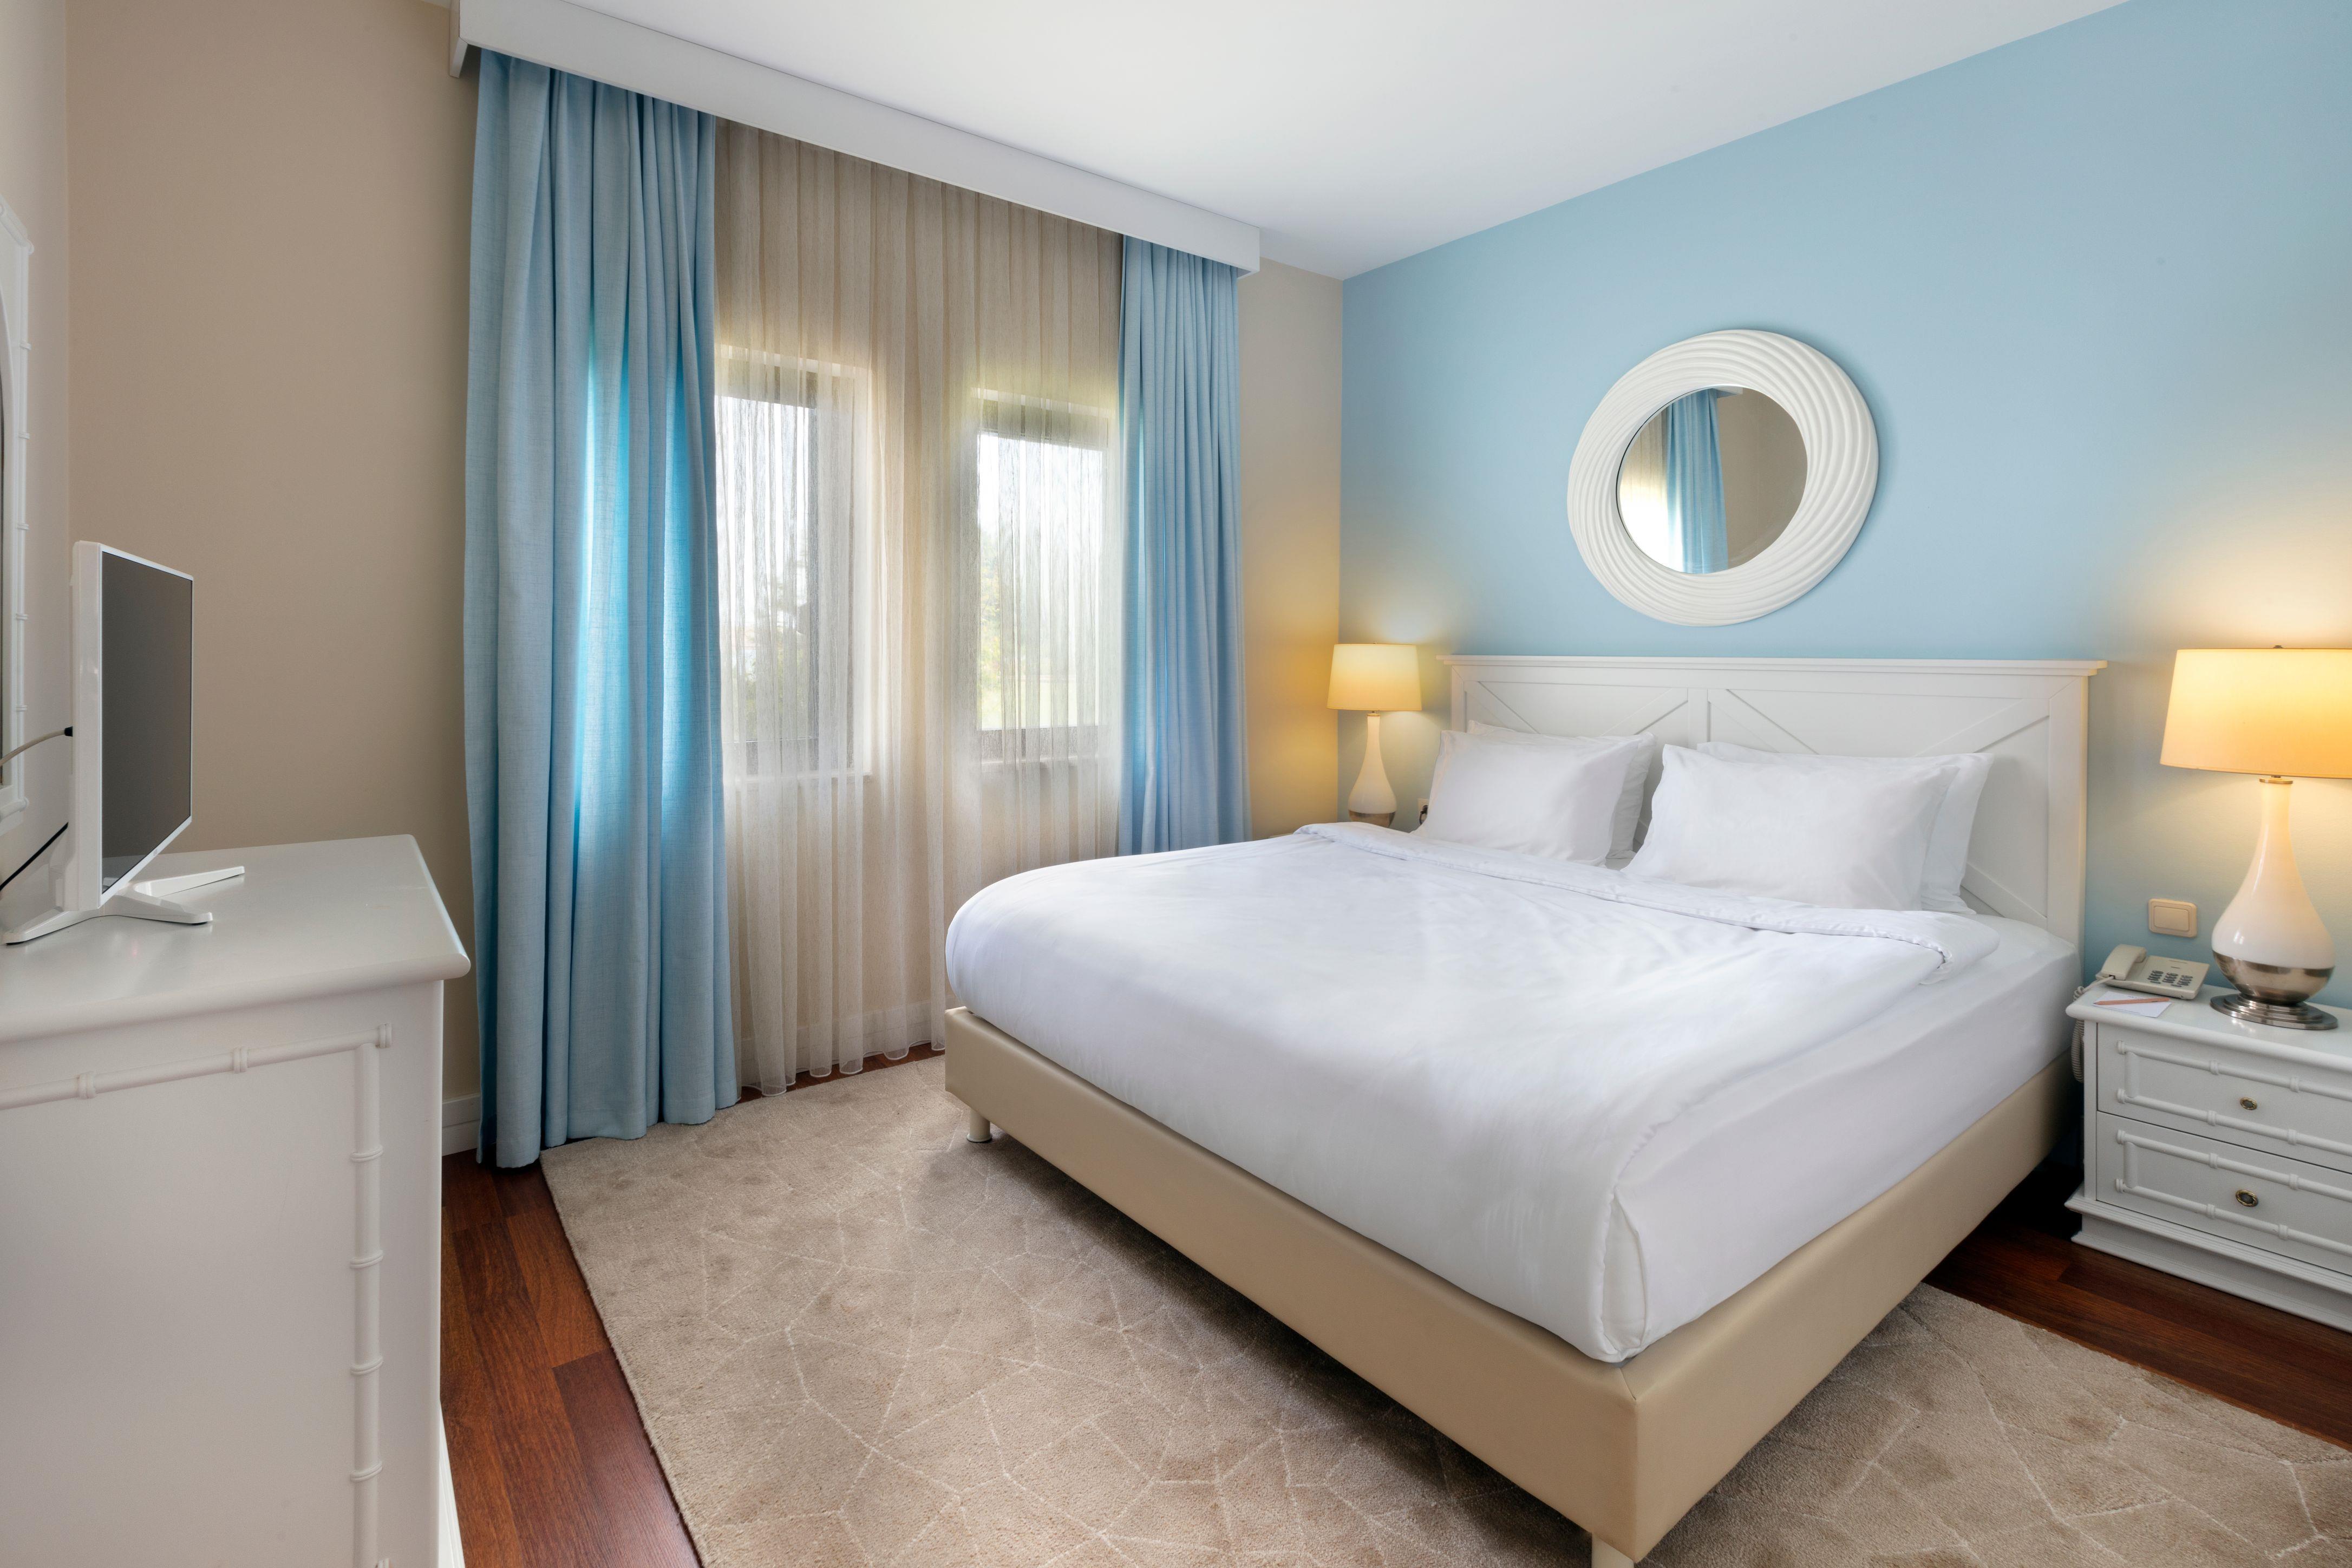 http://www.orextravel.sk/OREX/hotelphotos/zeynep-hotel-general-0023.jpg